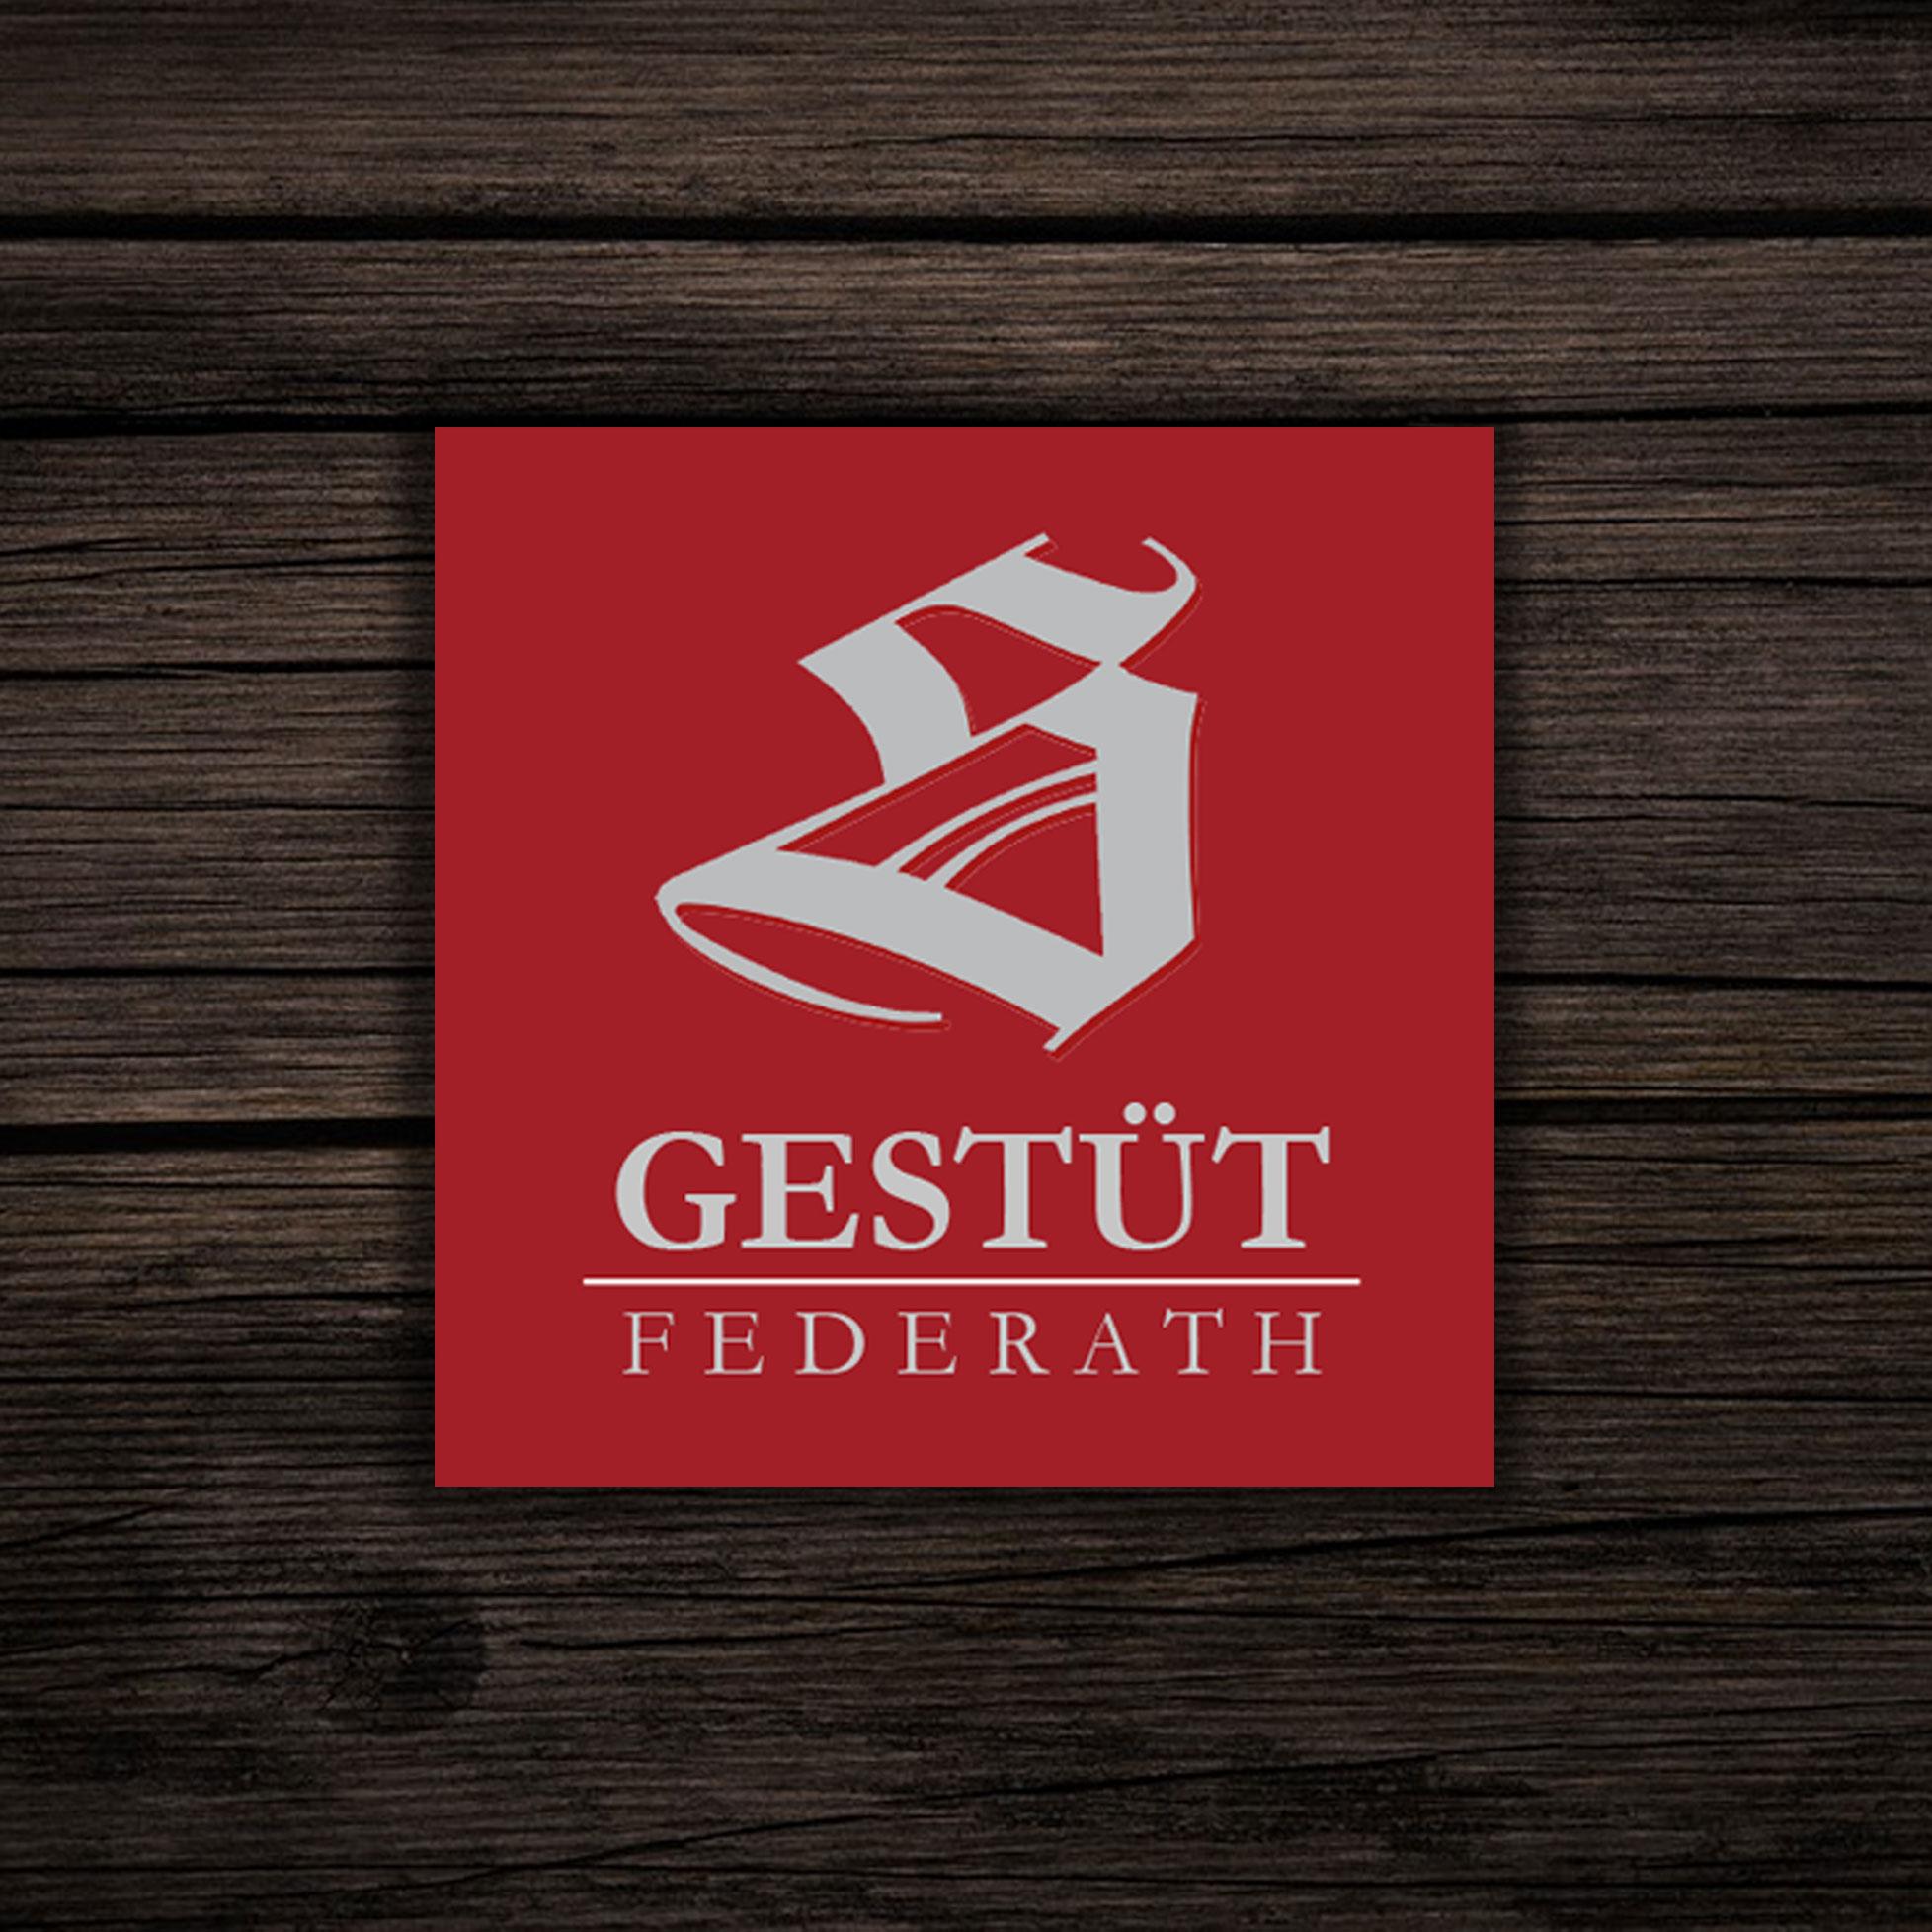 logo-Webtoelter.federath